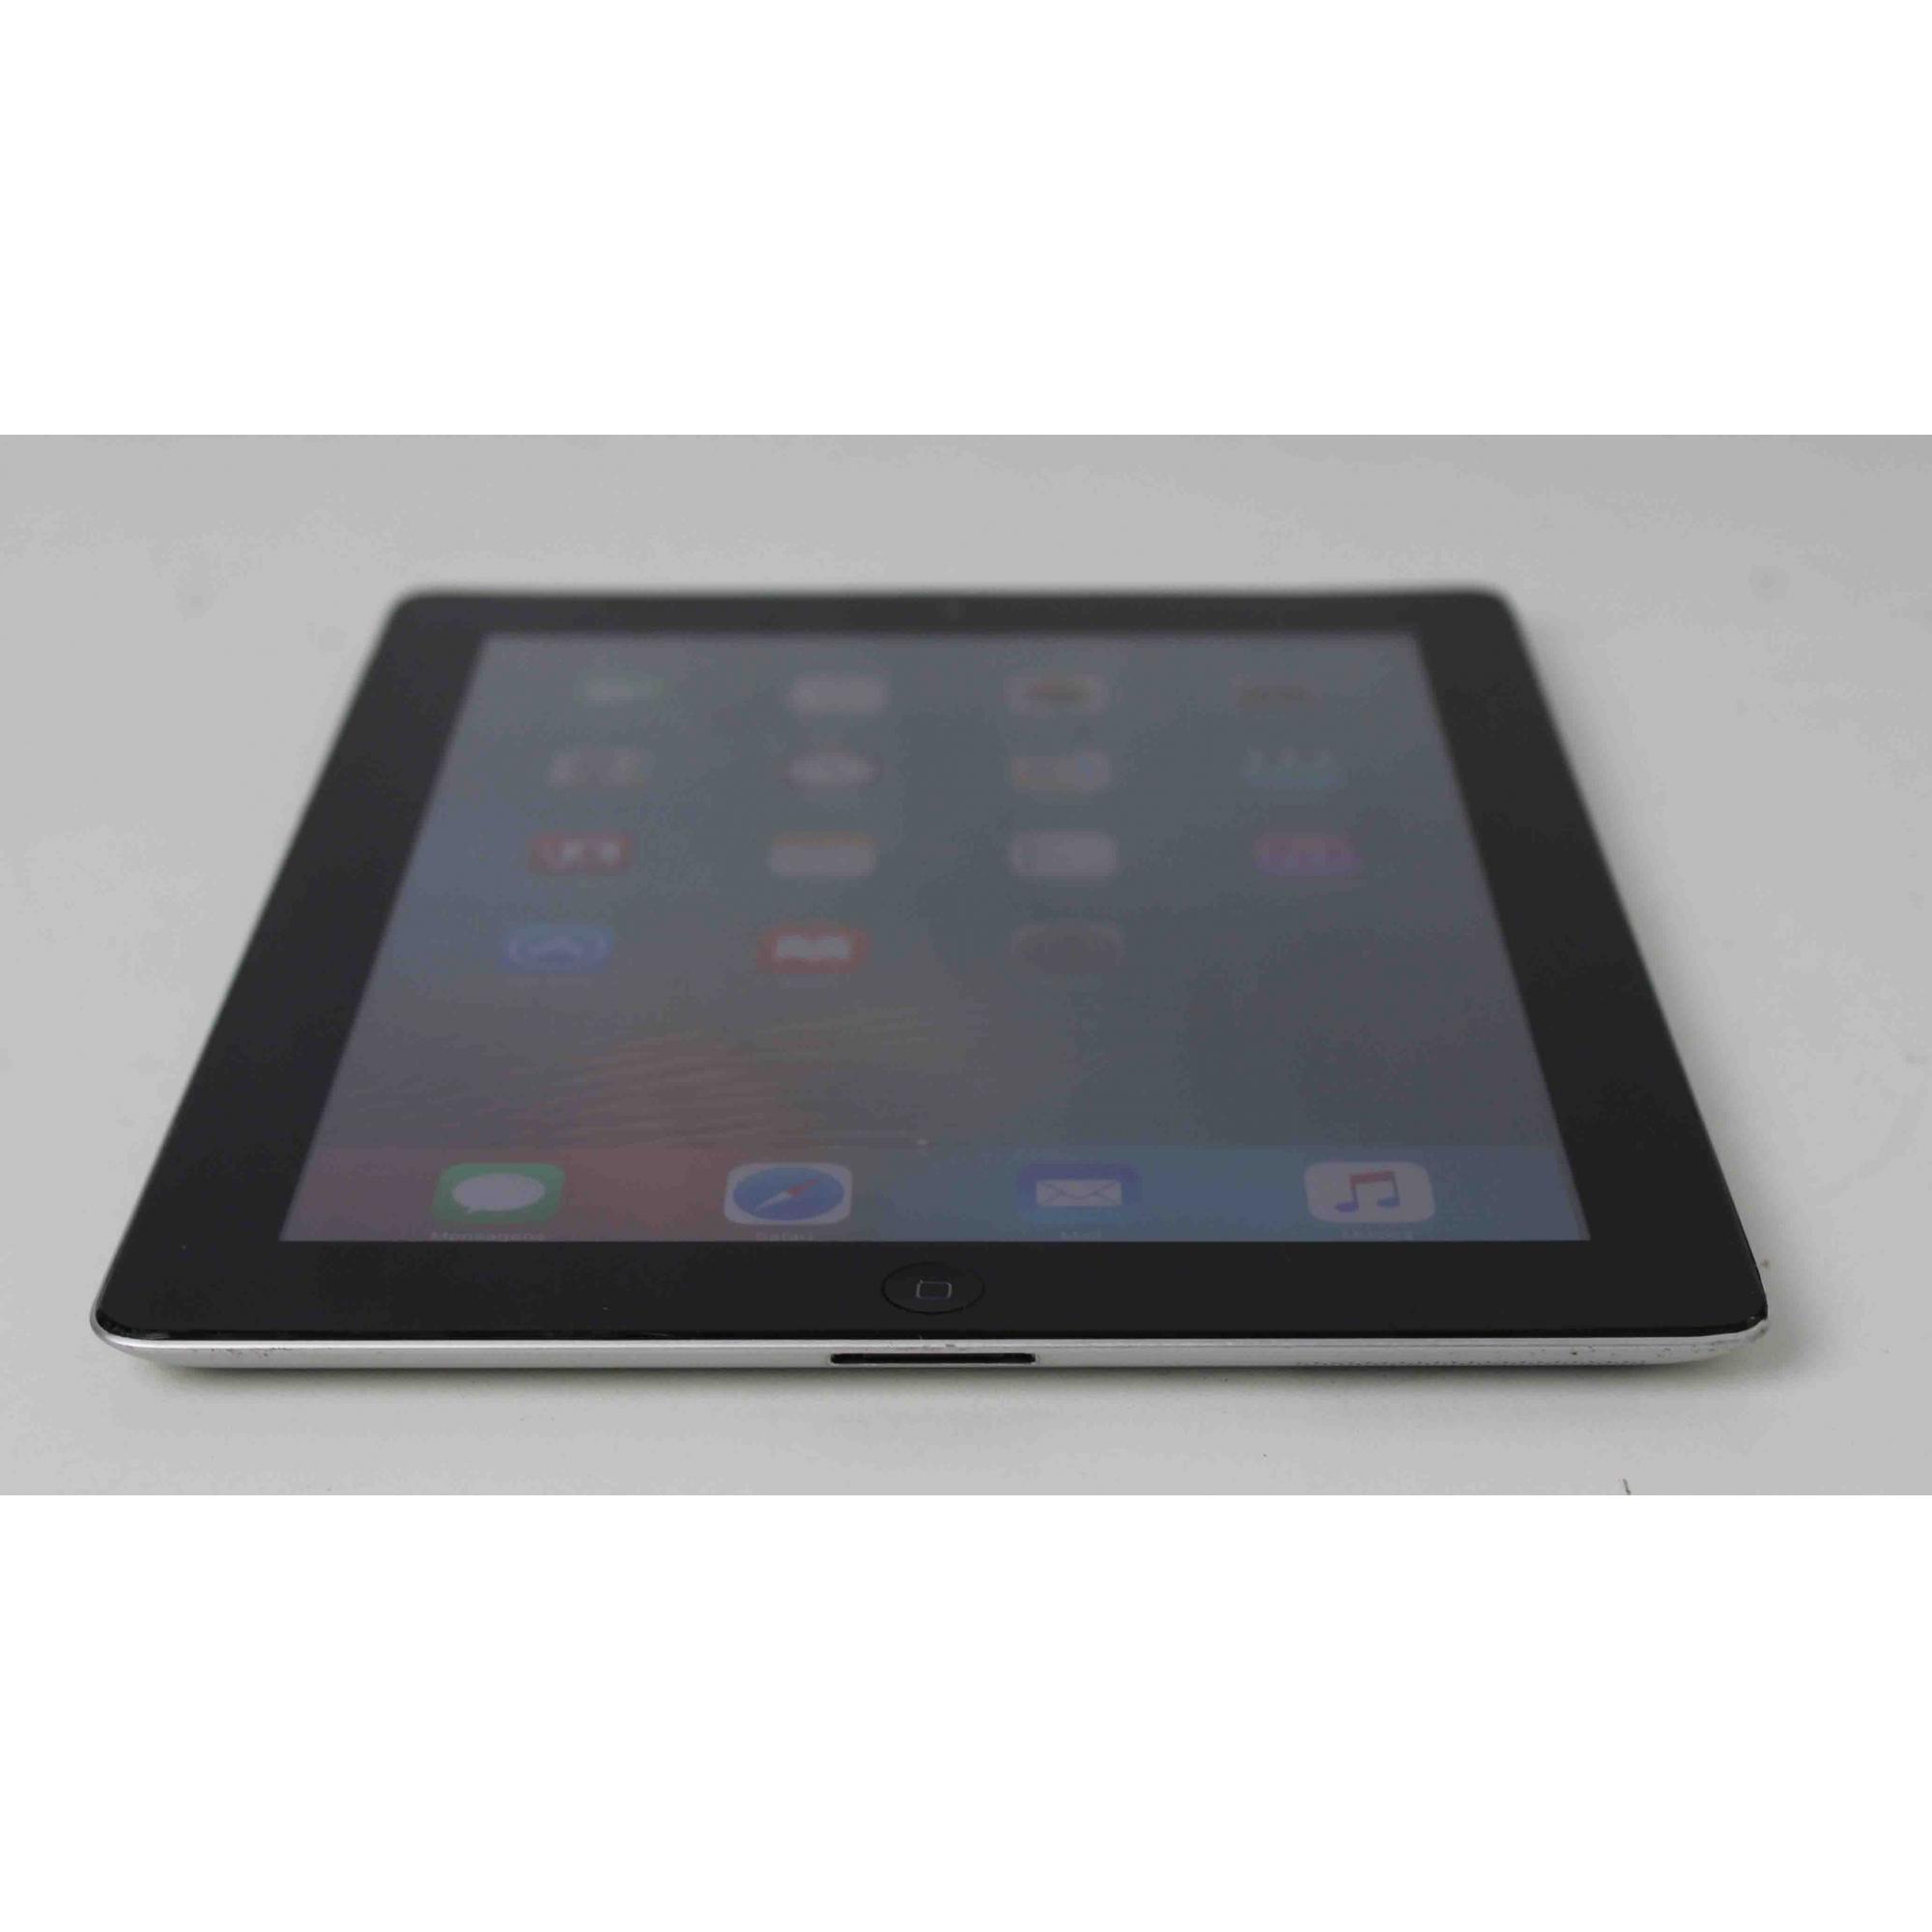 "iPad 3 MD368BR/A 9.7"" 64GB WIFI - Cinza espacial"